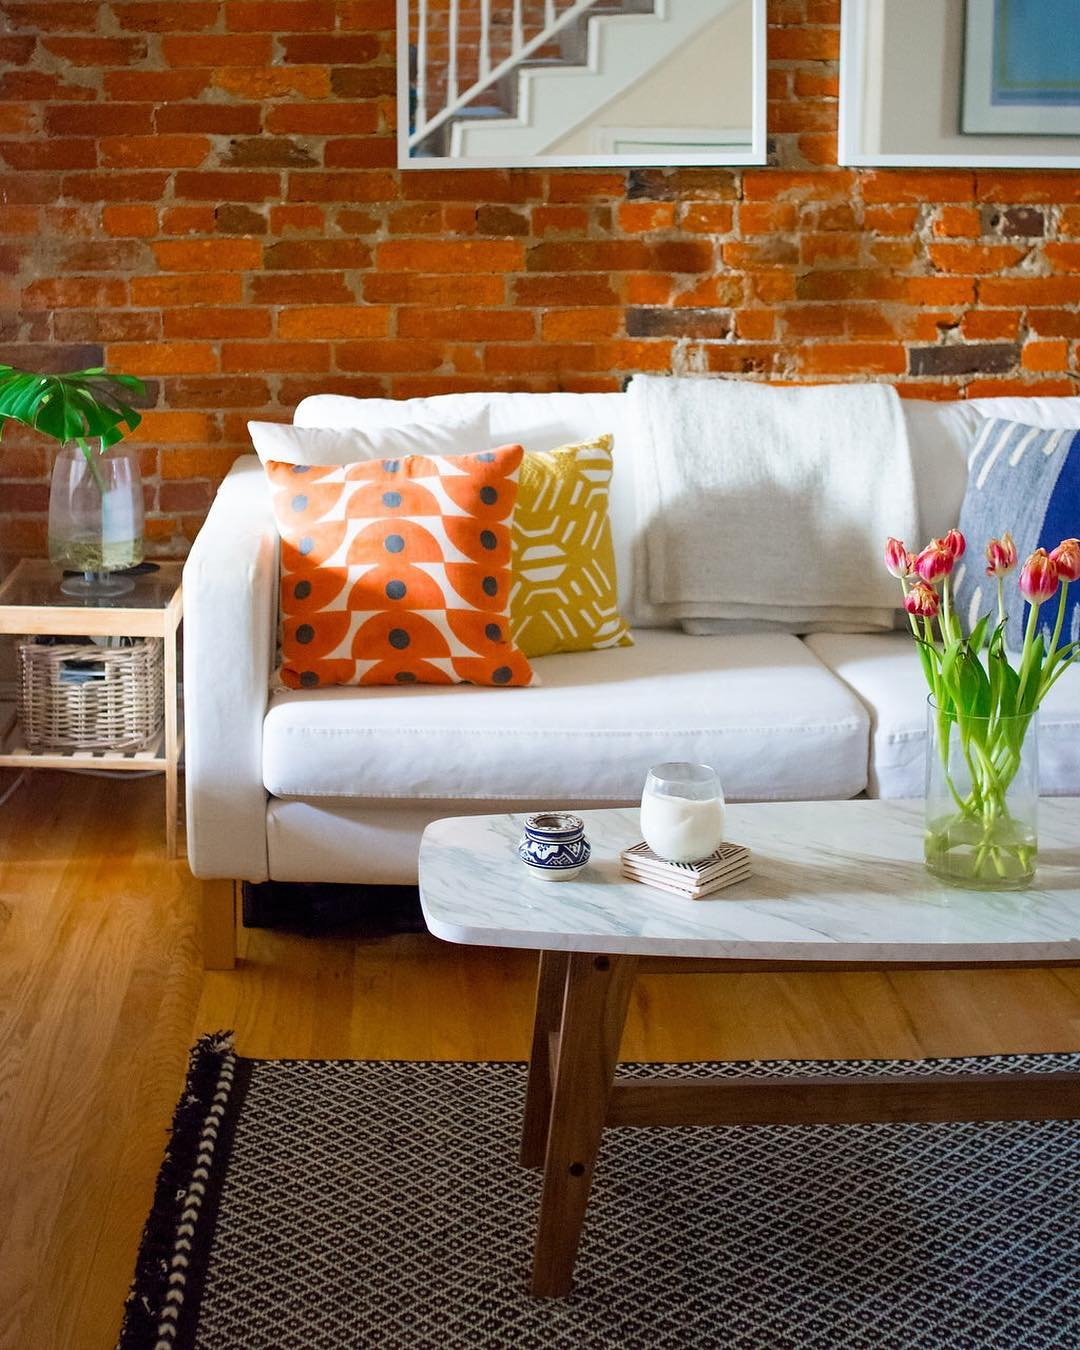 Orange and polka dot patterned pillows